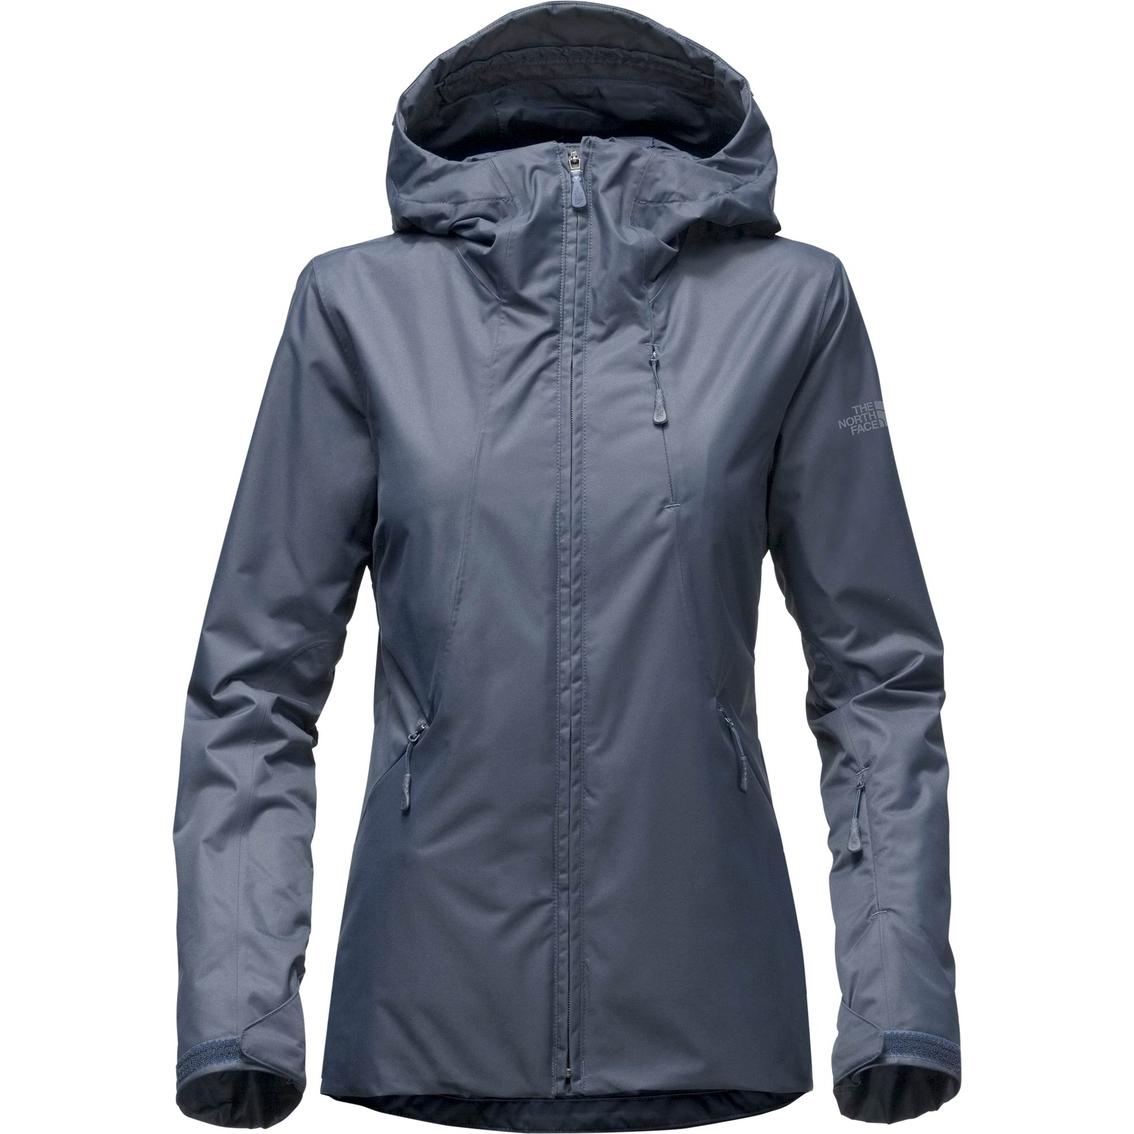 4cbf6cc0e The North Face Clementine Triclimate Ski Jacket | Jackets | Apparel ...